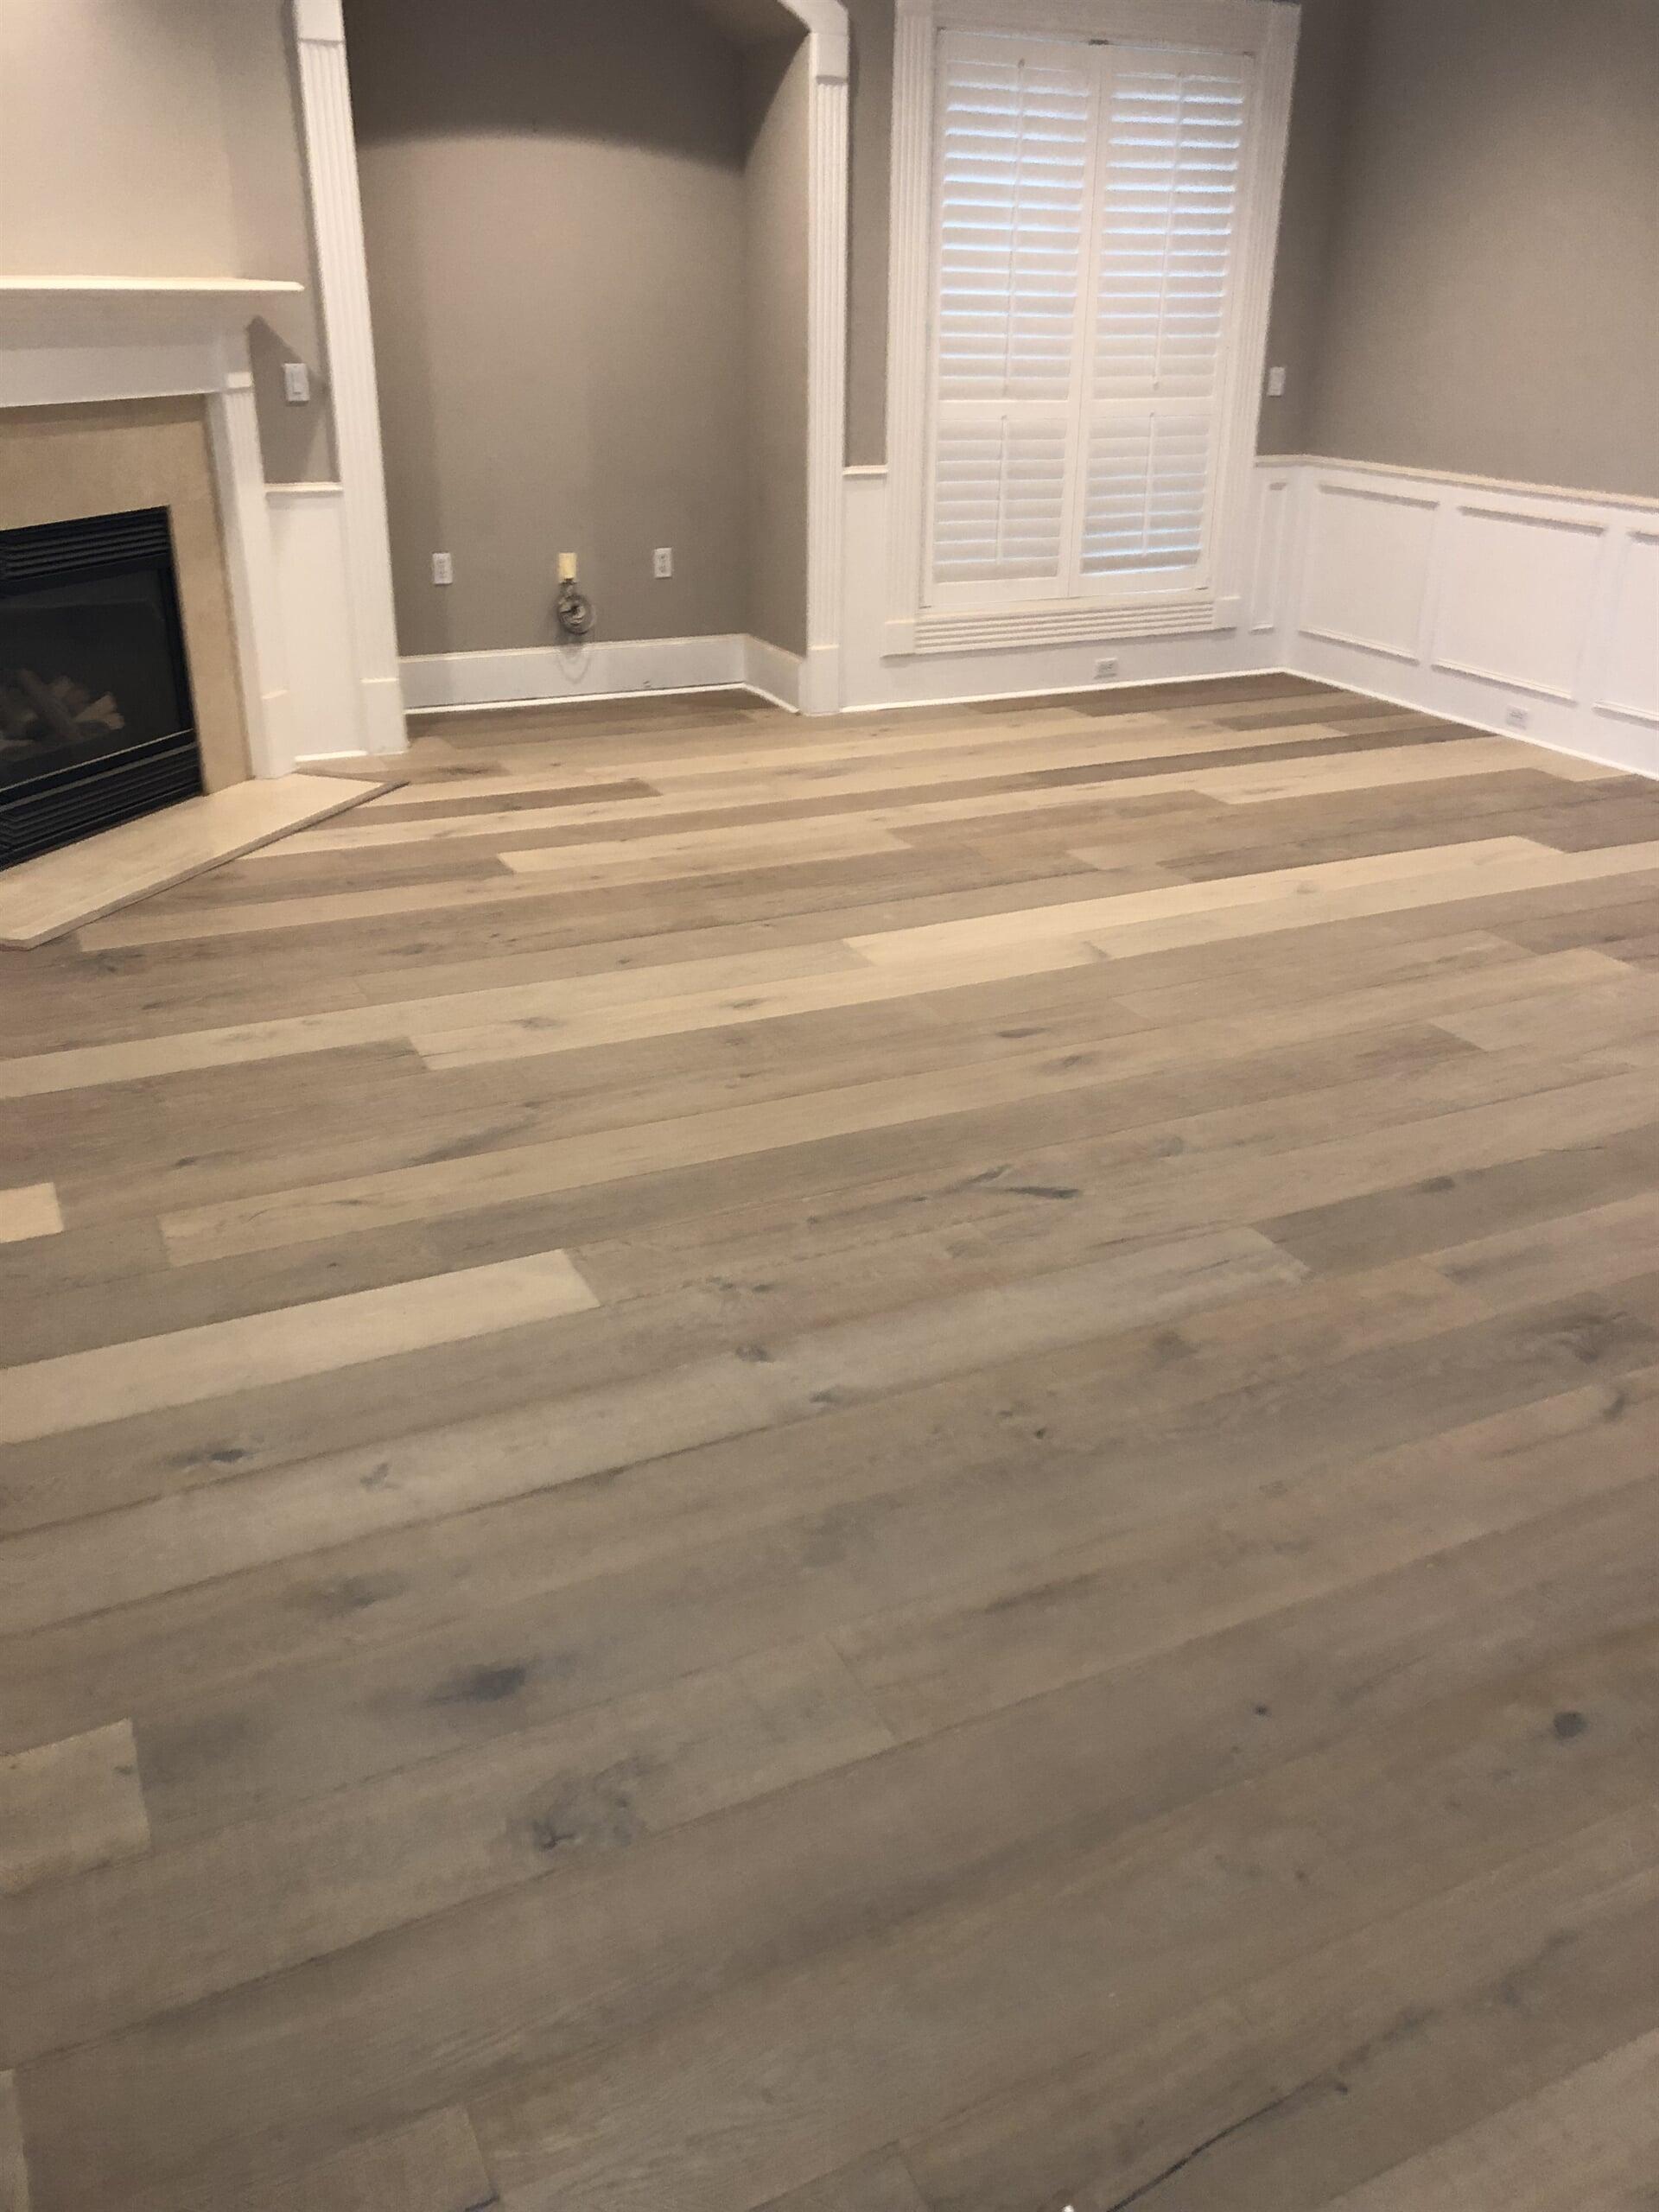 Engineered Hardwood flooring from Houston Floor Installation Services in Katy, TX